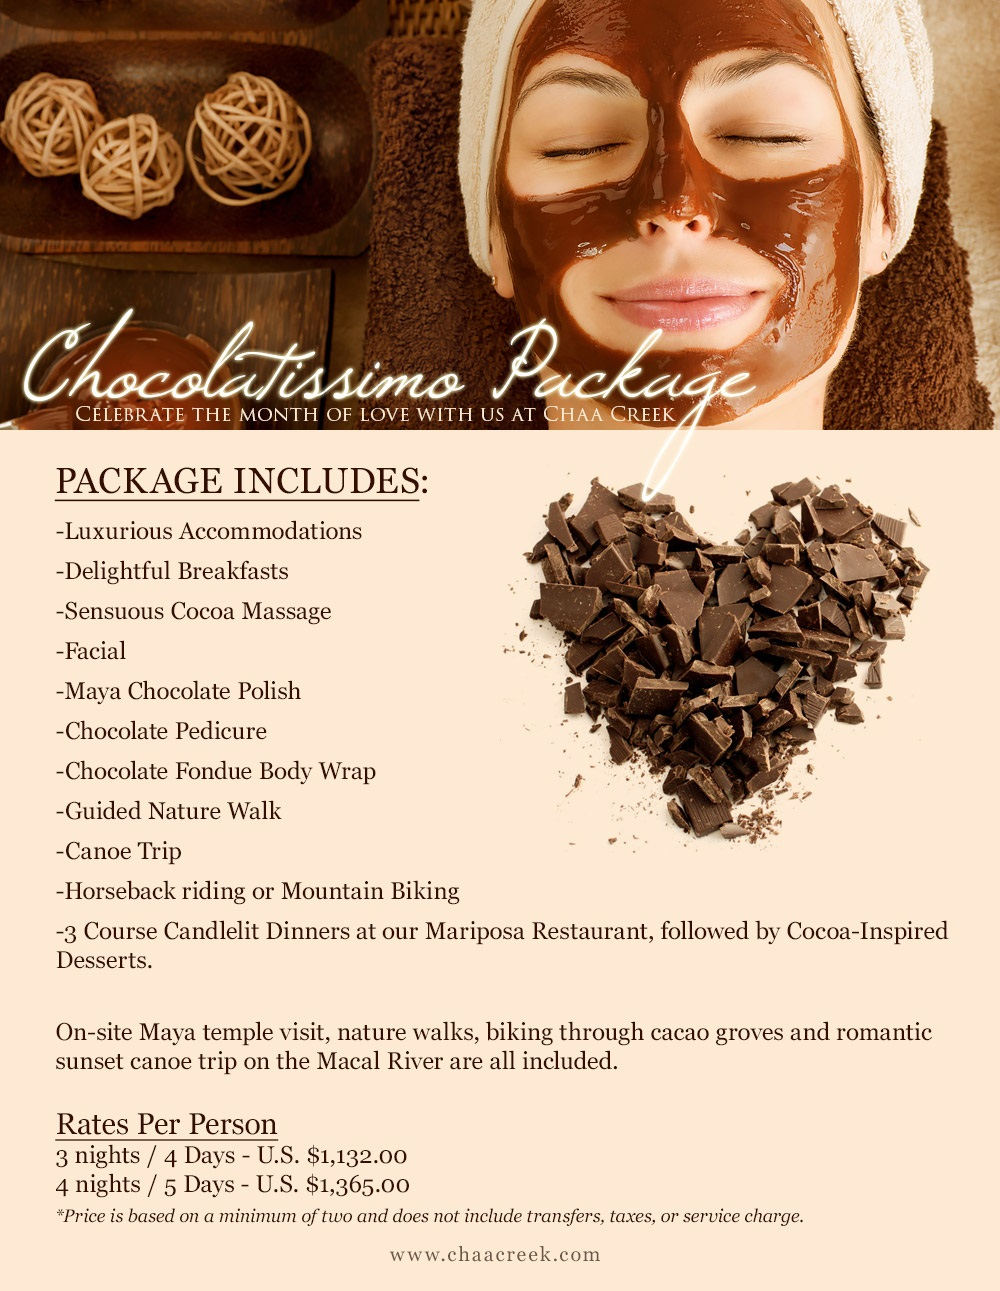 ChocolatissimoPackage2015